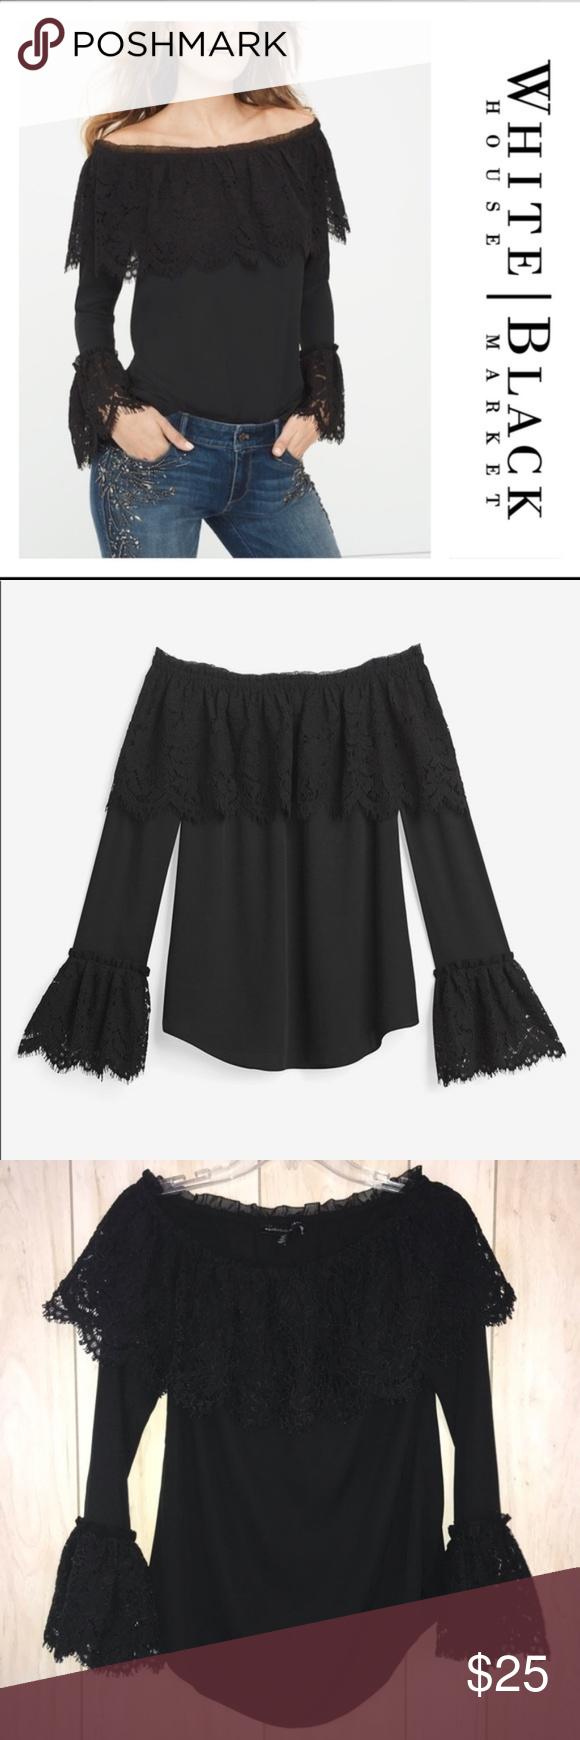 fdf8f5e564db0 WHBM Black Off-The-Shoulder Lace Trim Top White House Black Market Lace  ruffle